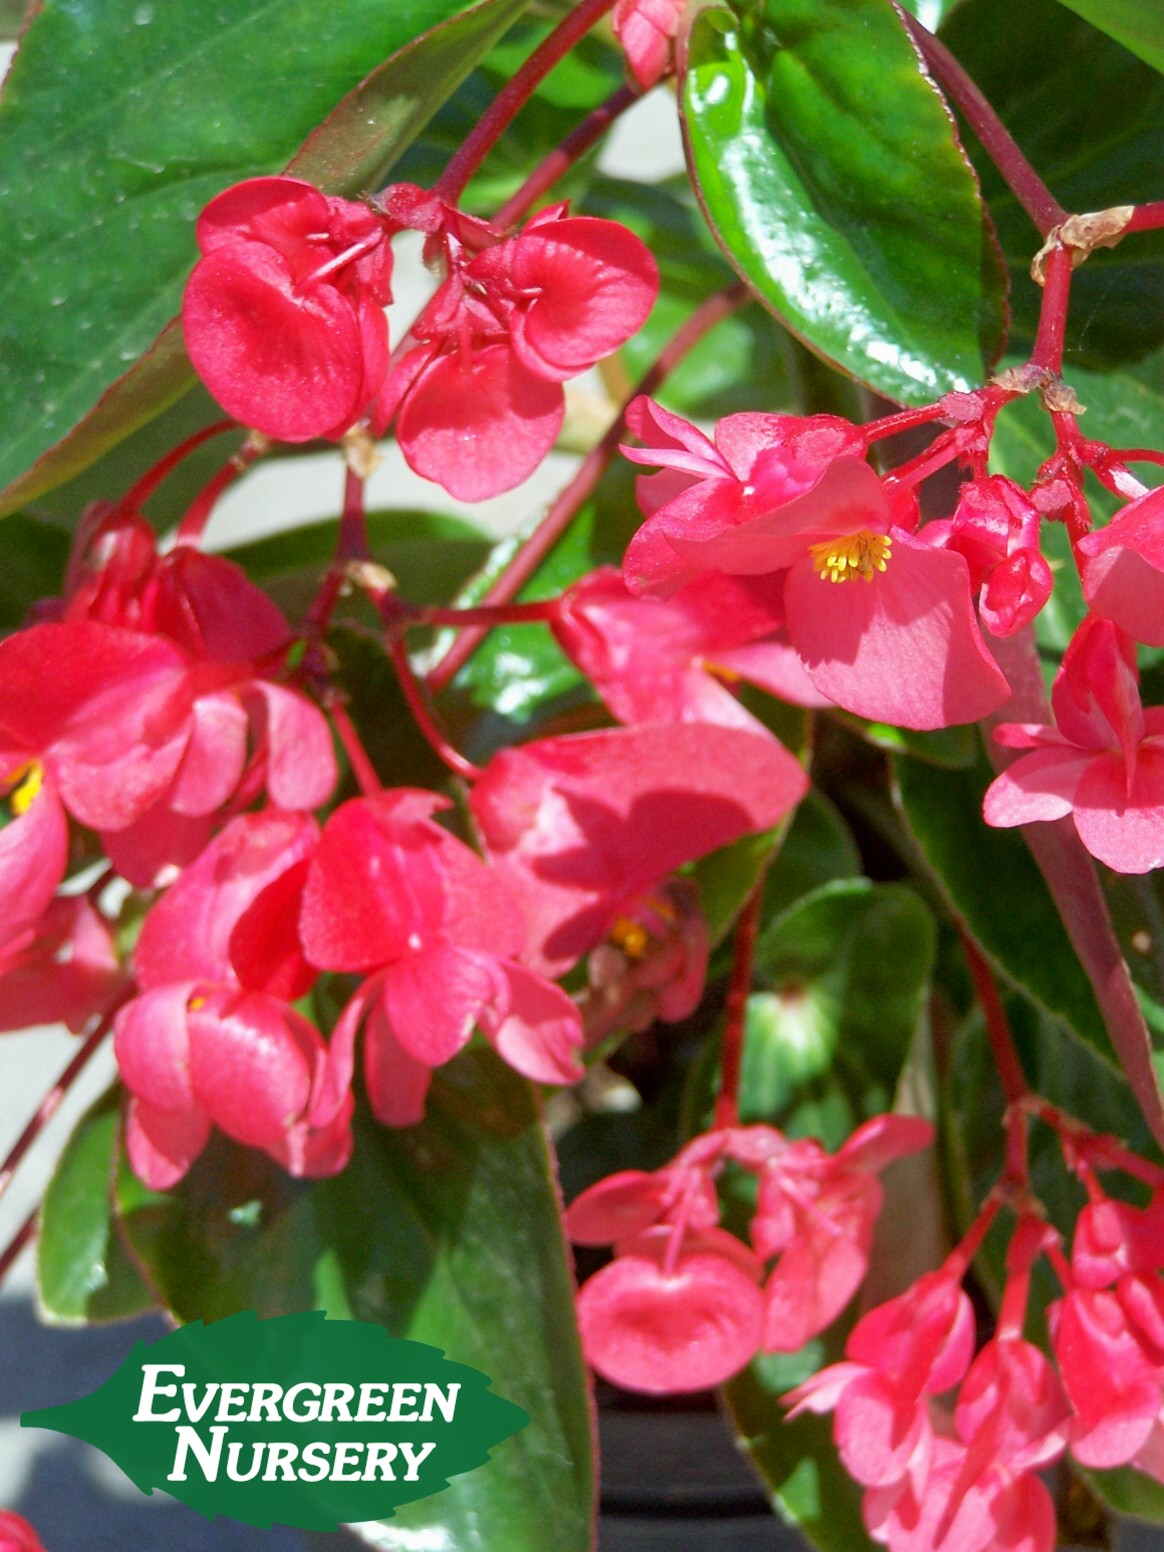 Begonia Dragon Wing Evergreen Nursery